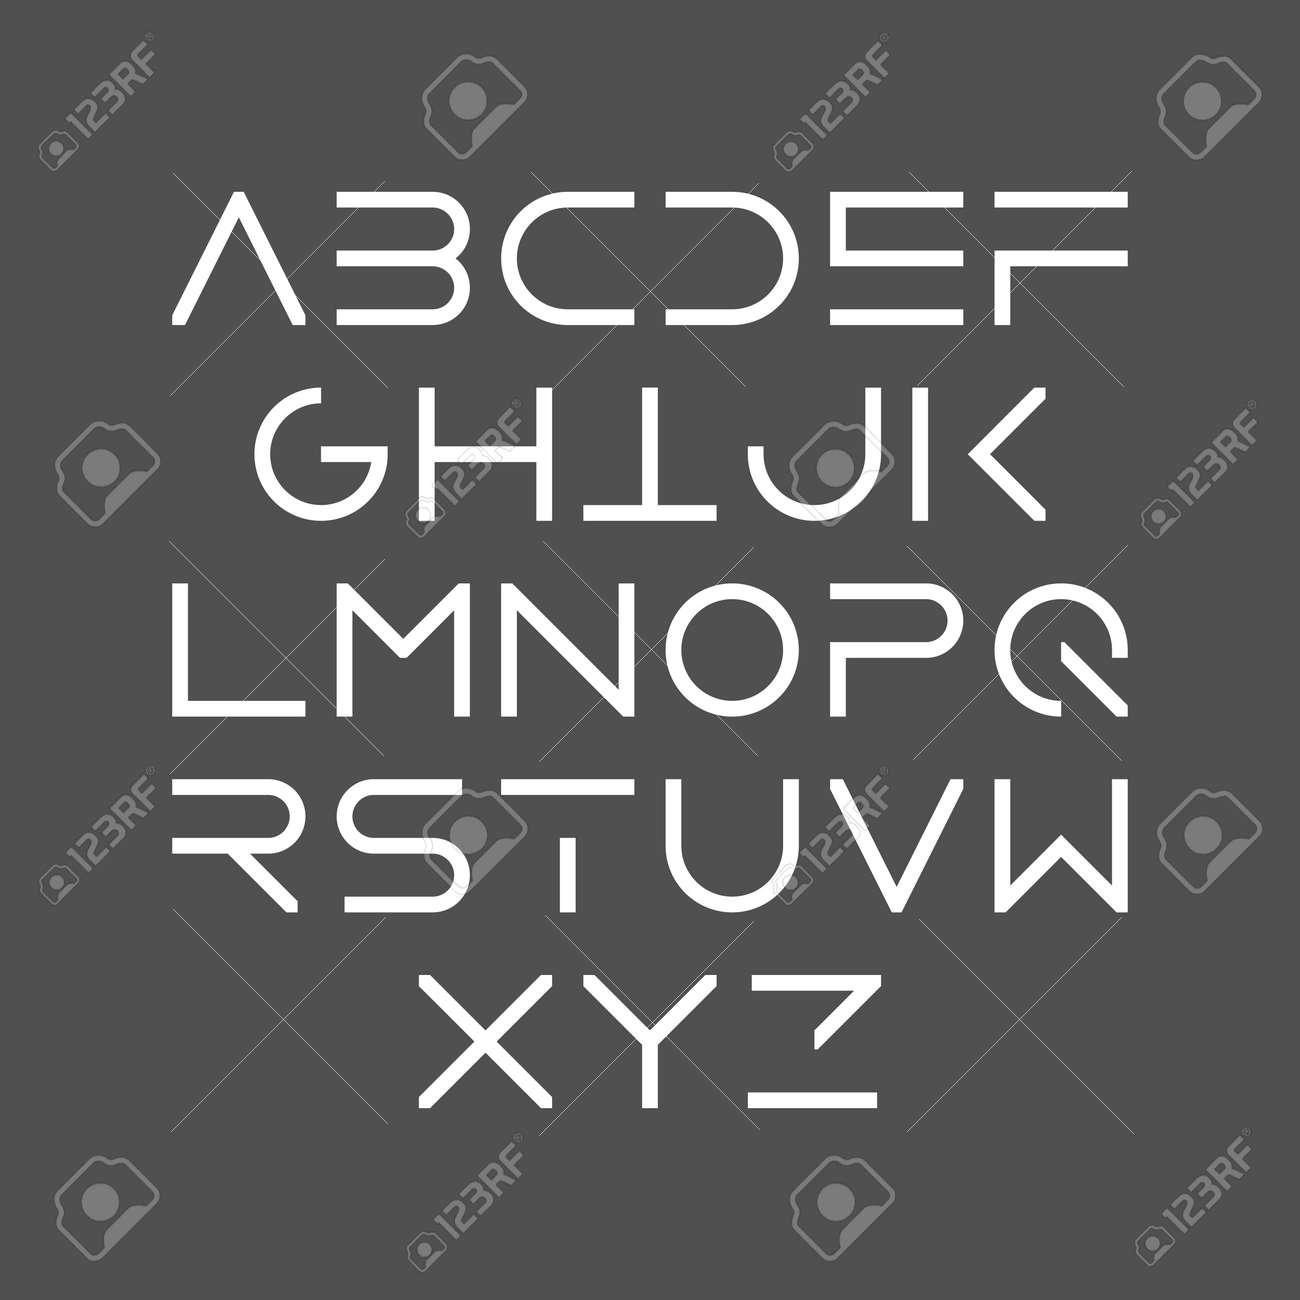 Thin line bold style uppercase modern font, typeface, minimalist style. Latin alphabet letters. - 58649875